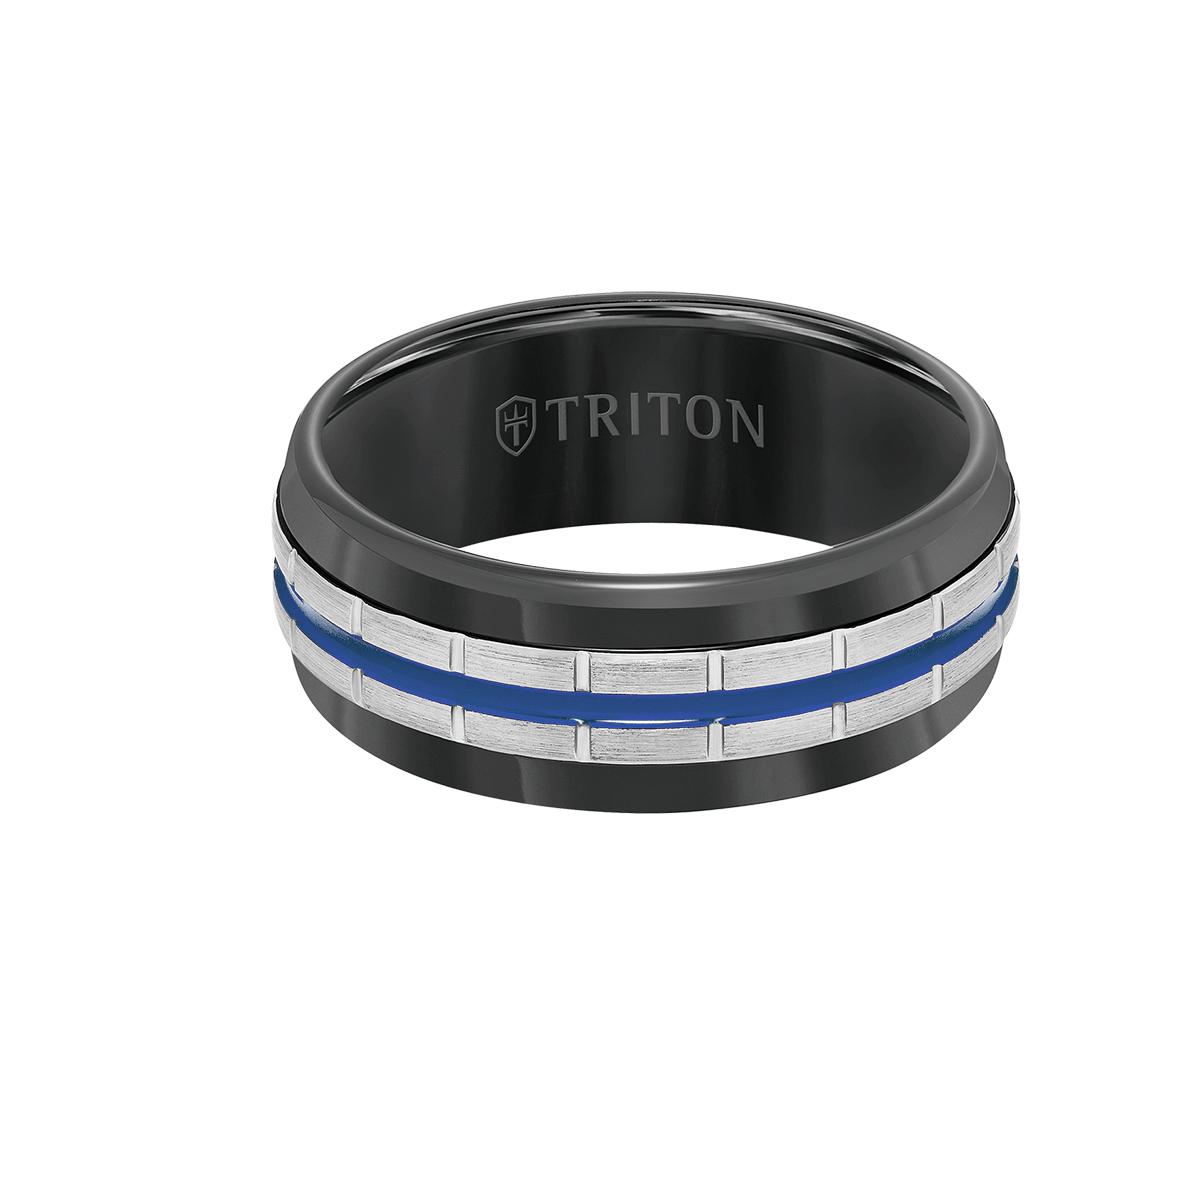 Triton VOLTAGE RING Black Tungsten Carbide Ring for Men with Blue Stripe